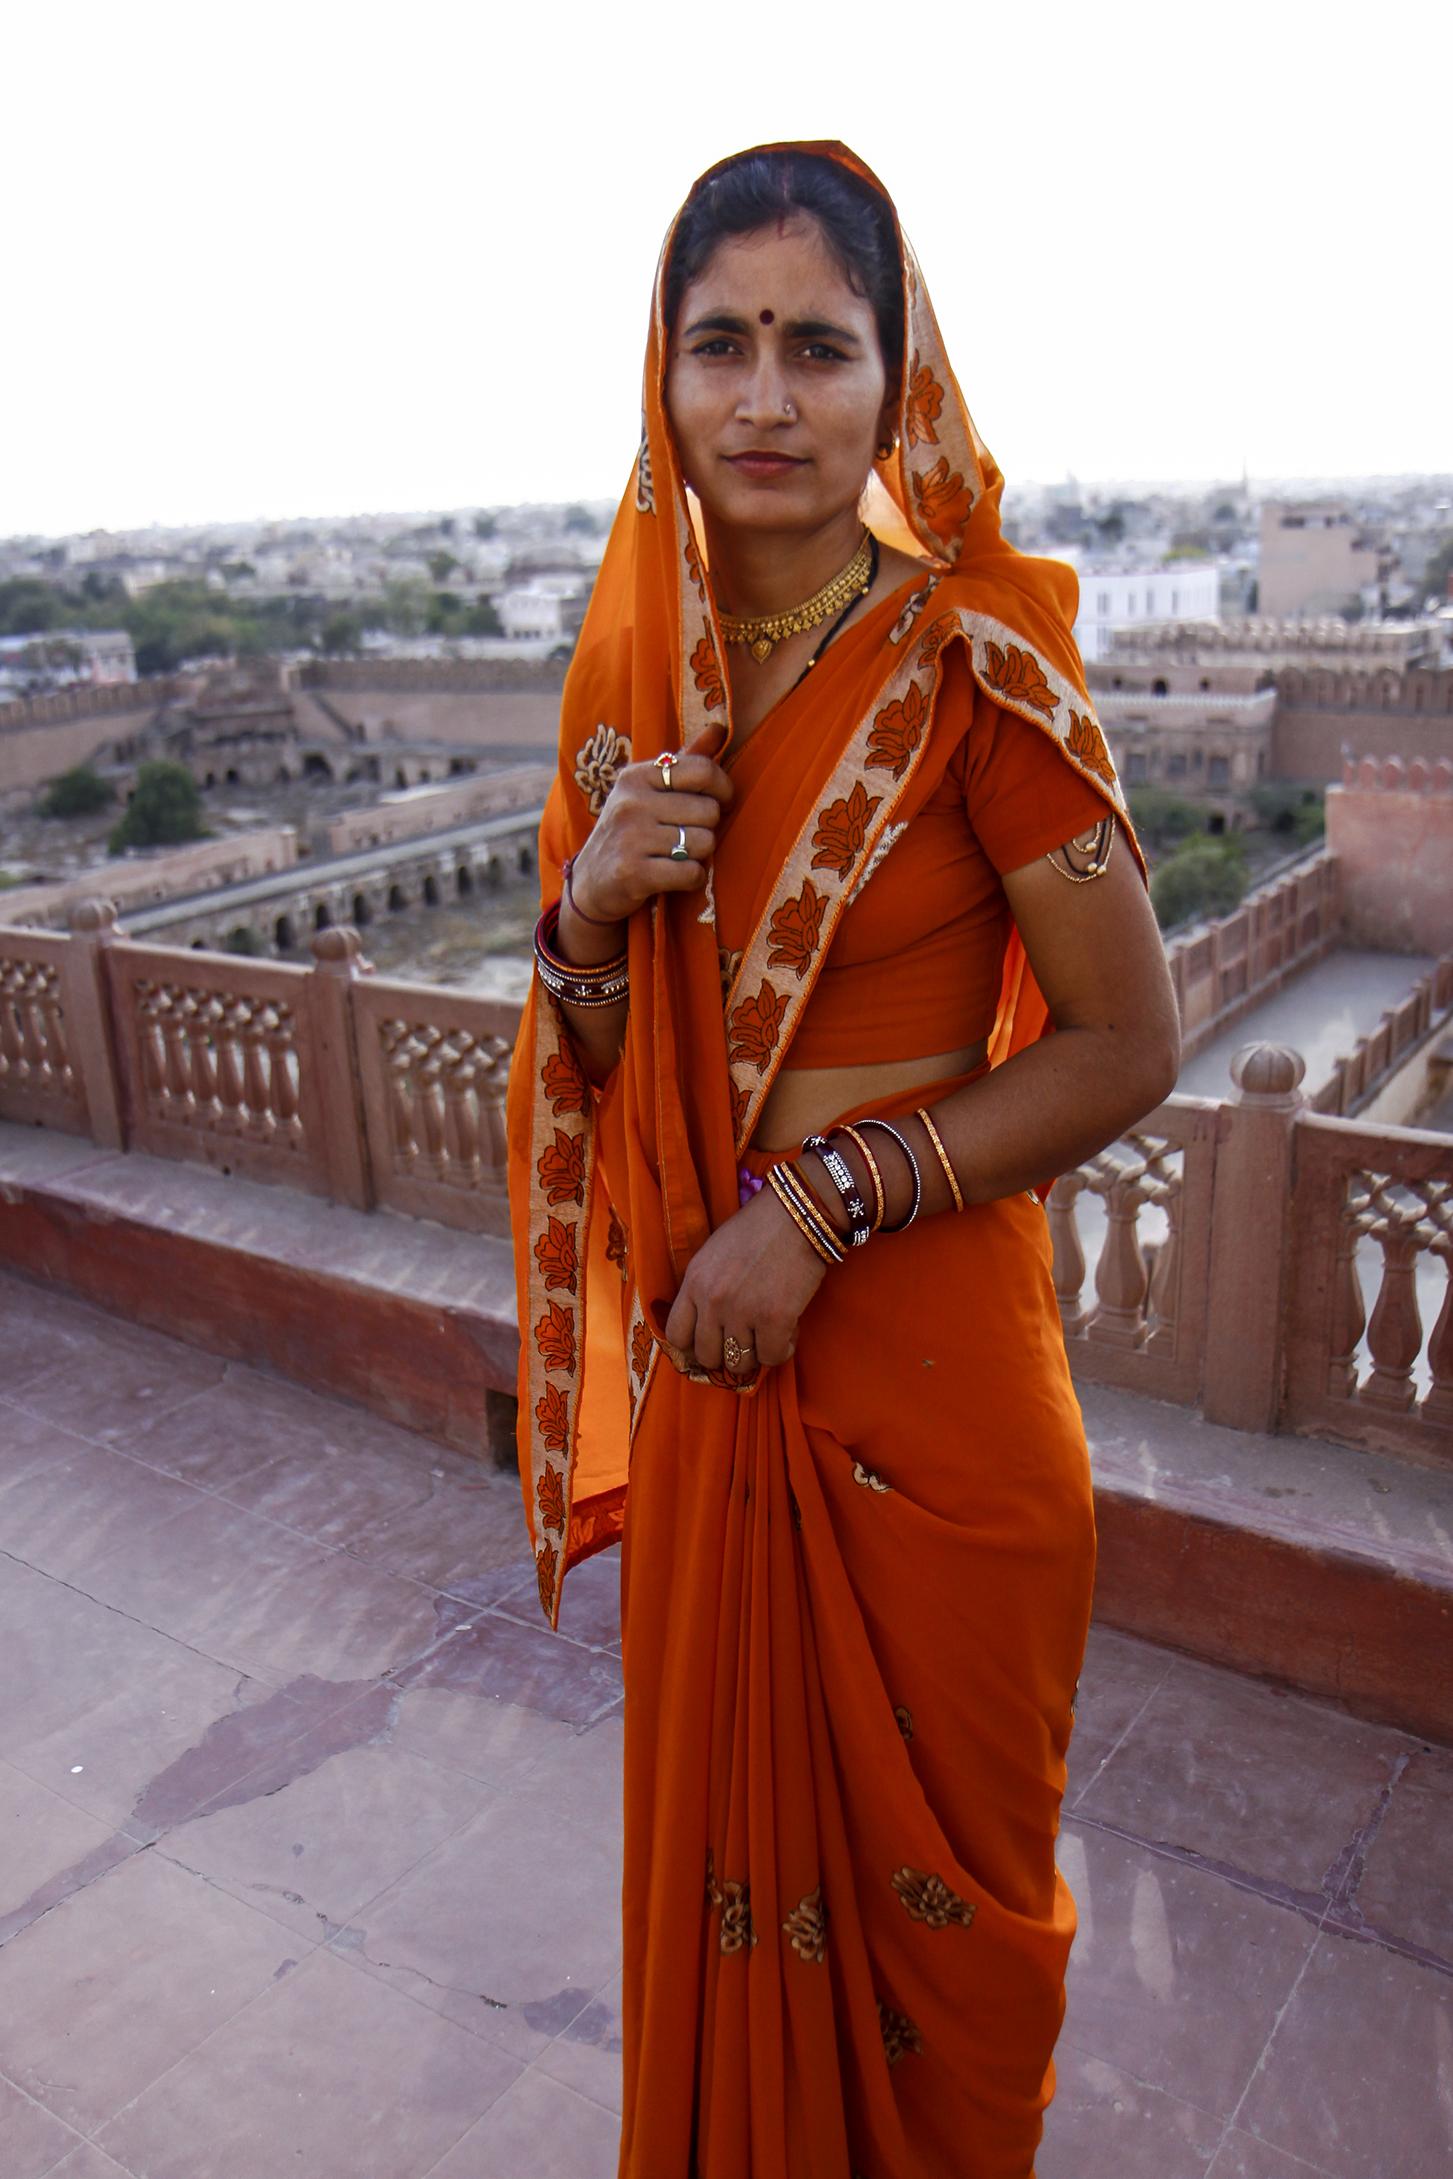 portraits-indien-inde-rajasthan-2010-marie-colette-becker-22